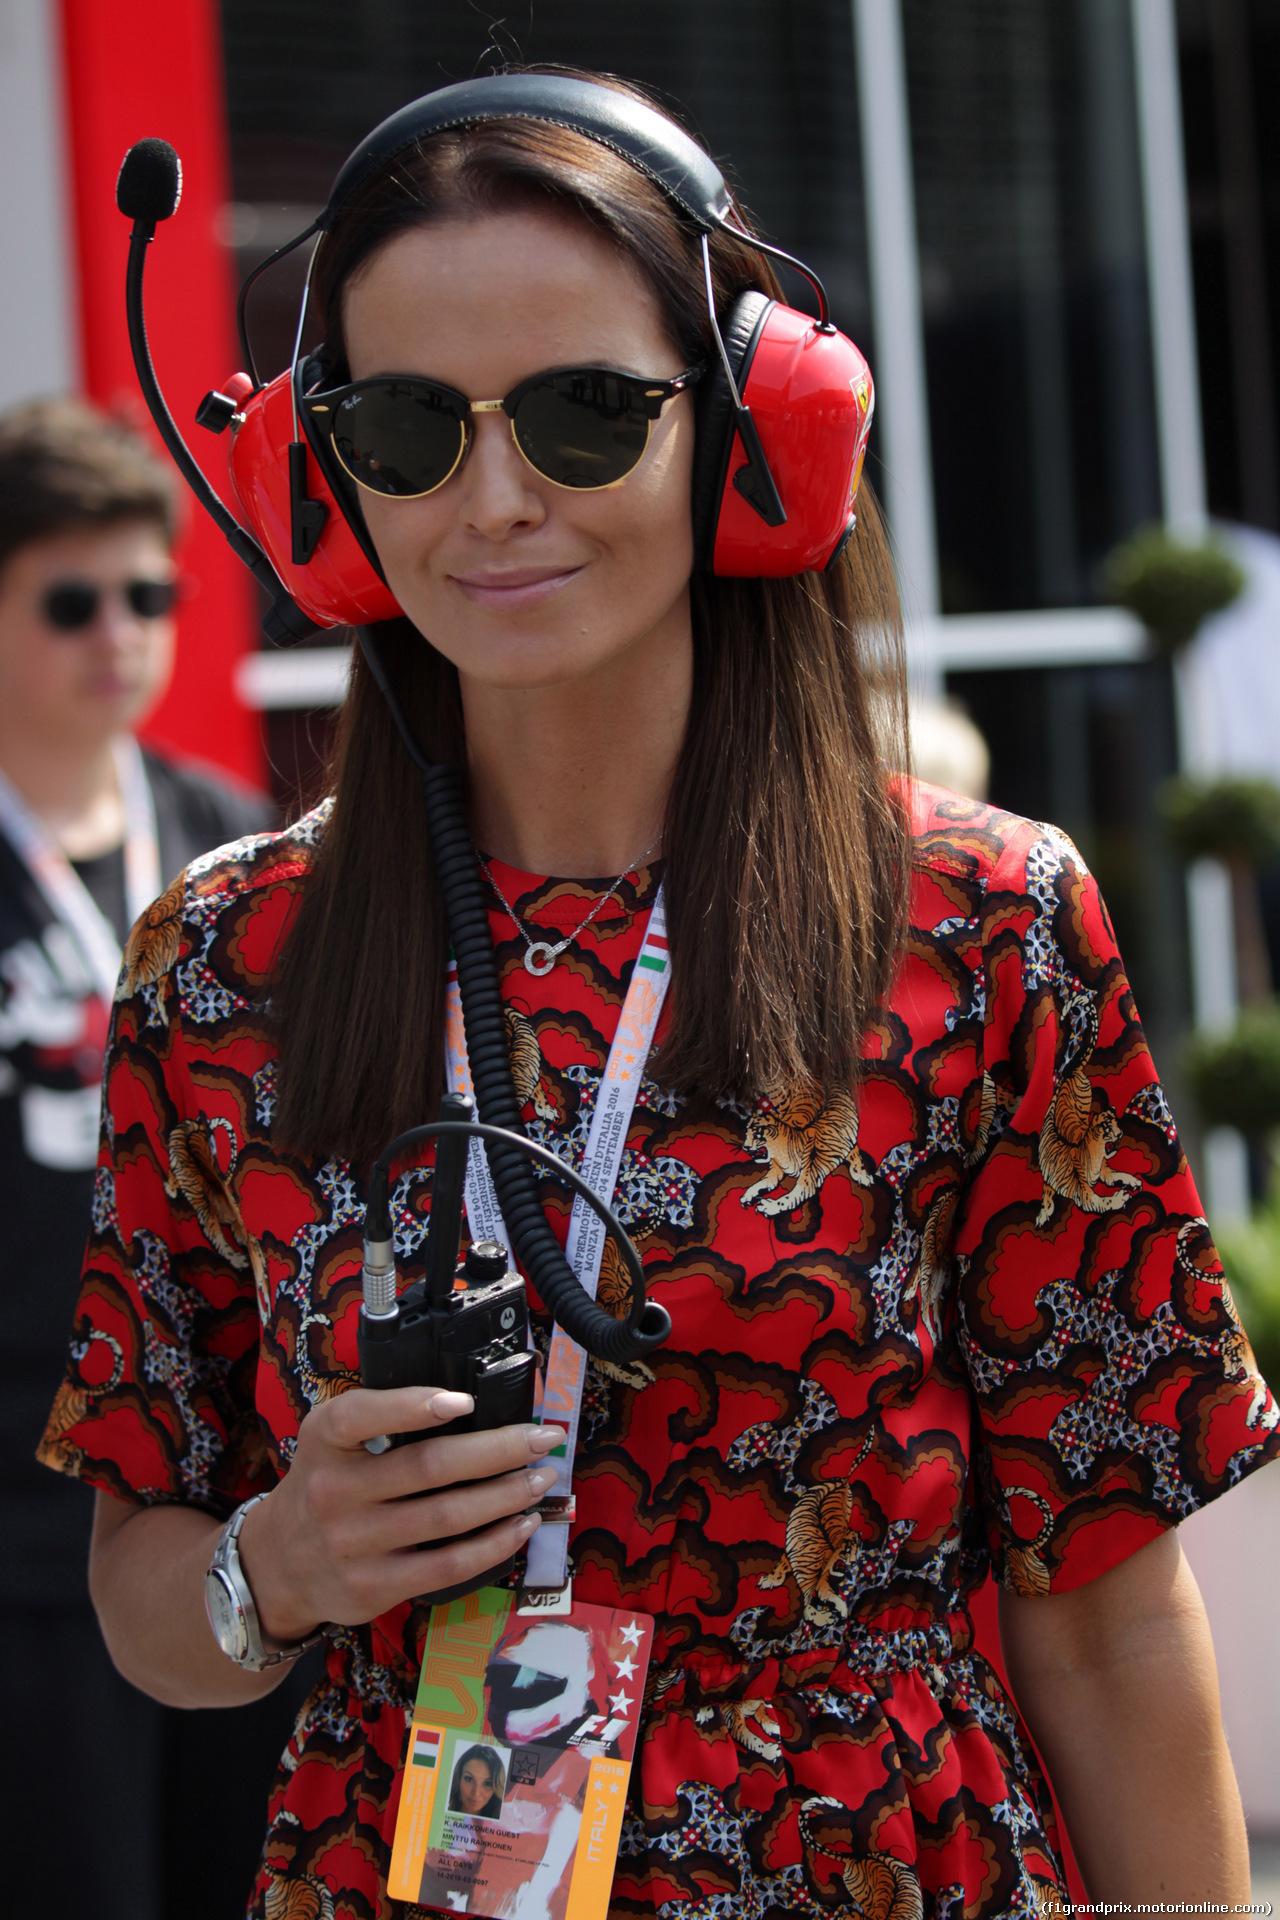 GP ITALIA, 03.09.2016 - Minttu Raikkonen, wife of Kimi Raikkonen (FIN)